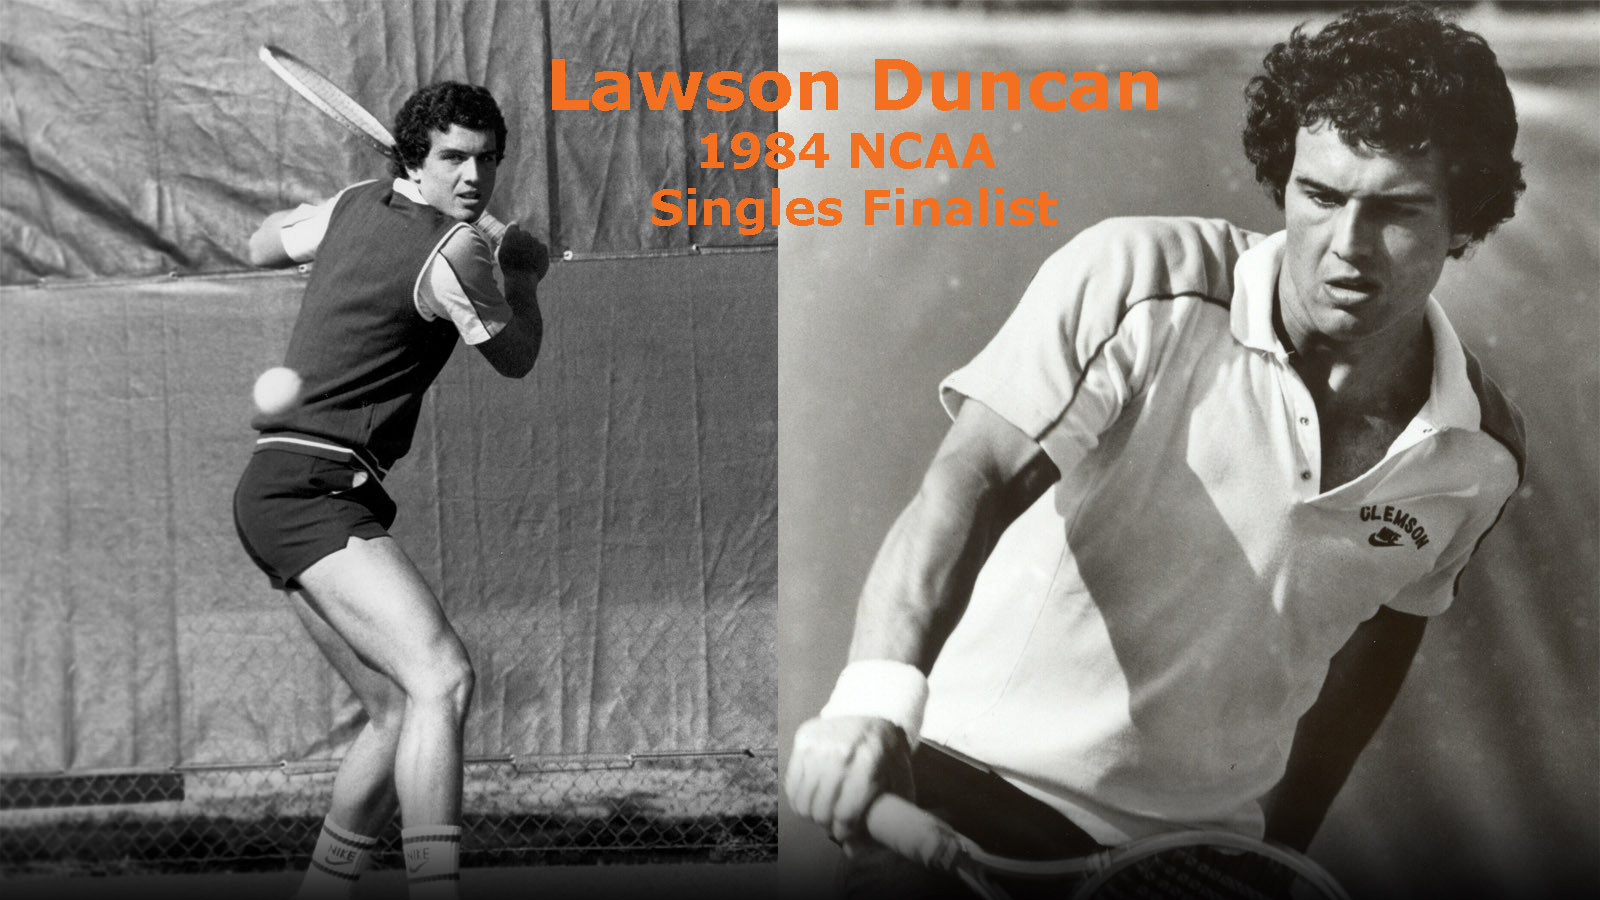 CLEMSON VAULT:  Tennis Great, Lawson Duncan